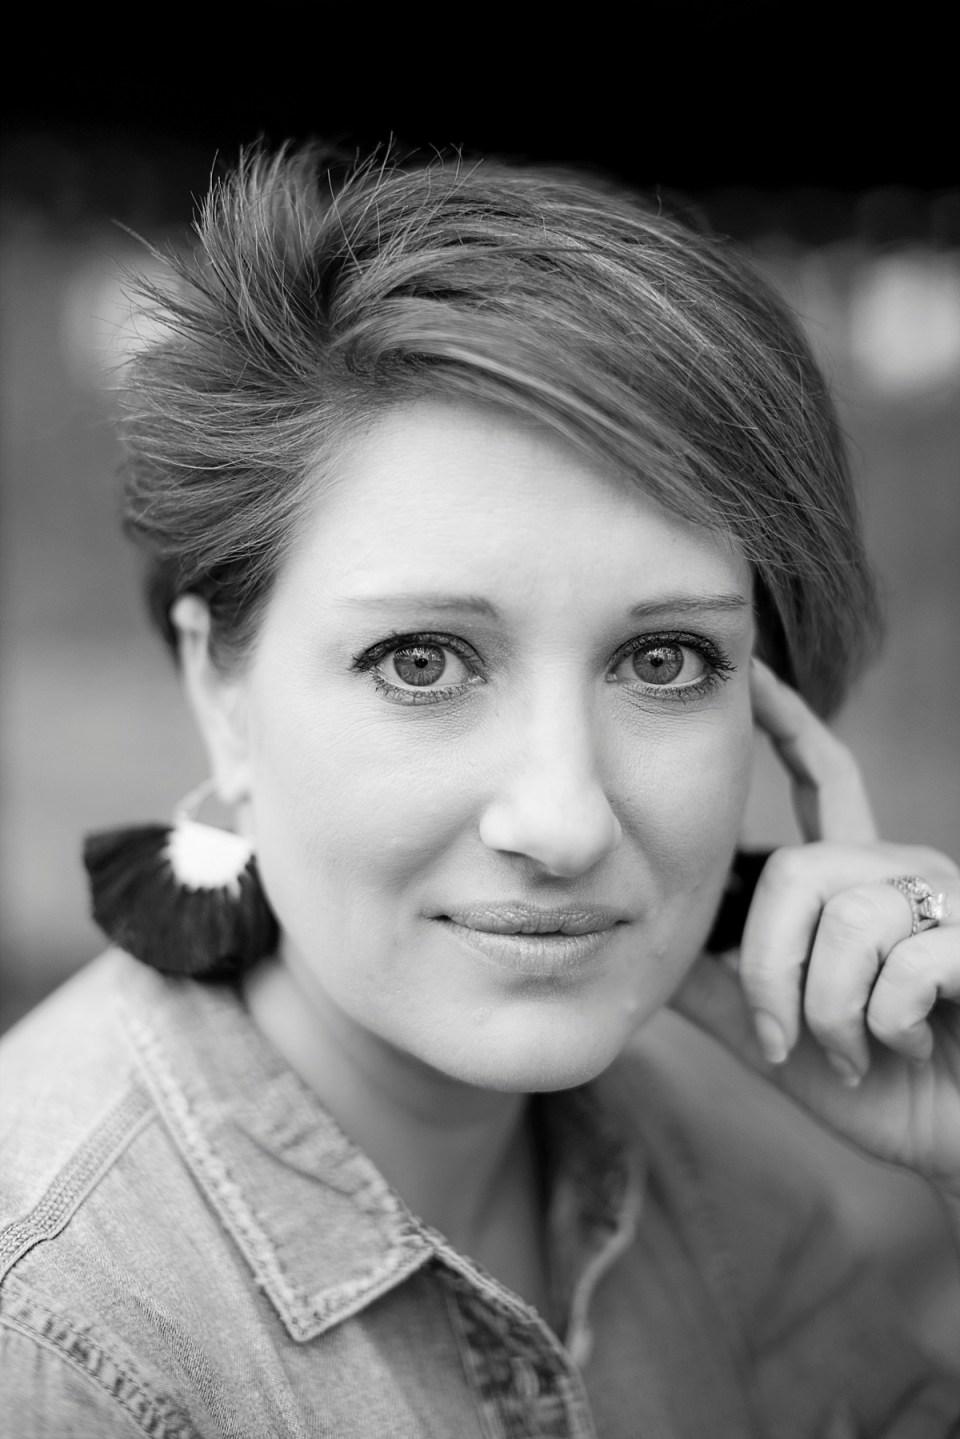 Headshot Portrait of Erin Tetterton in Black and White